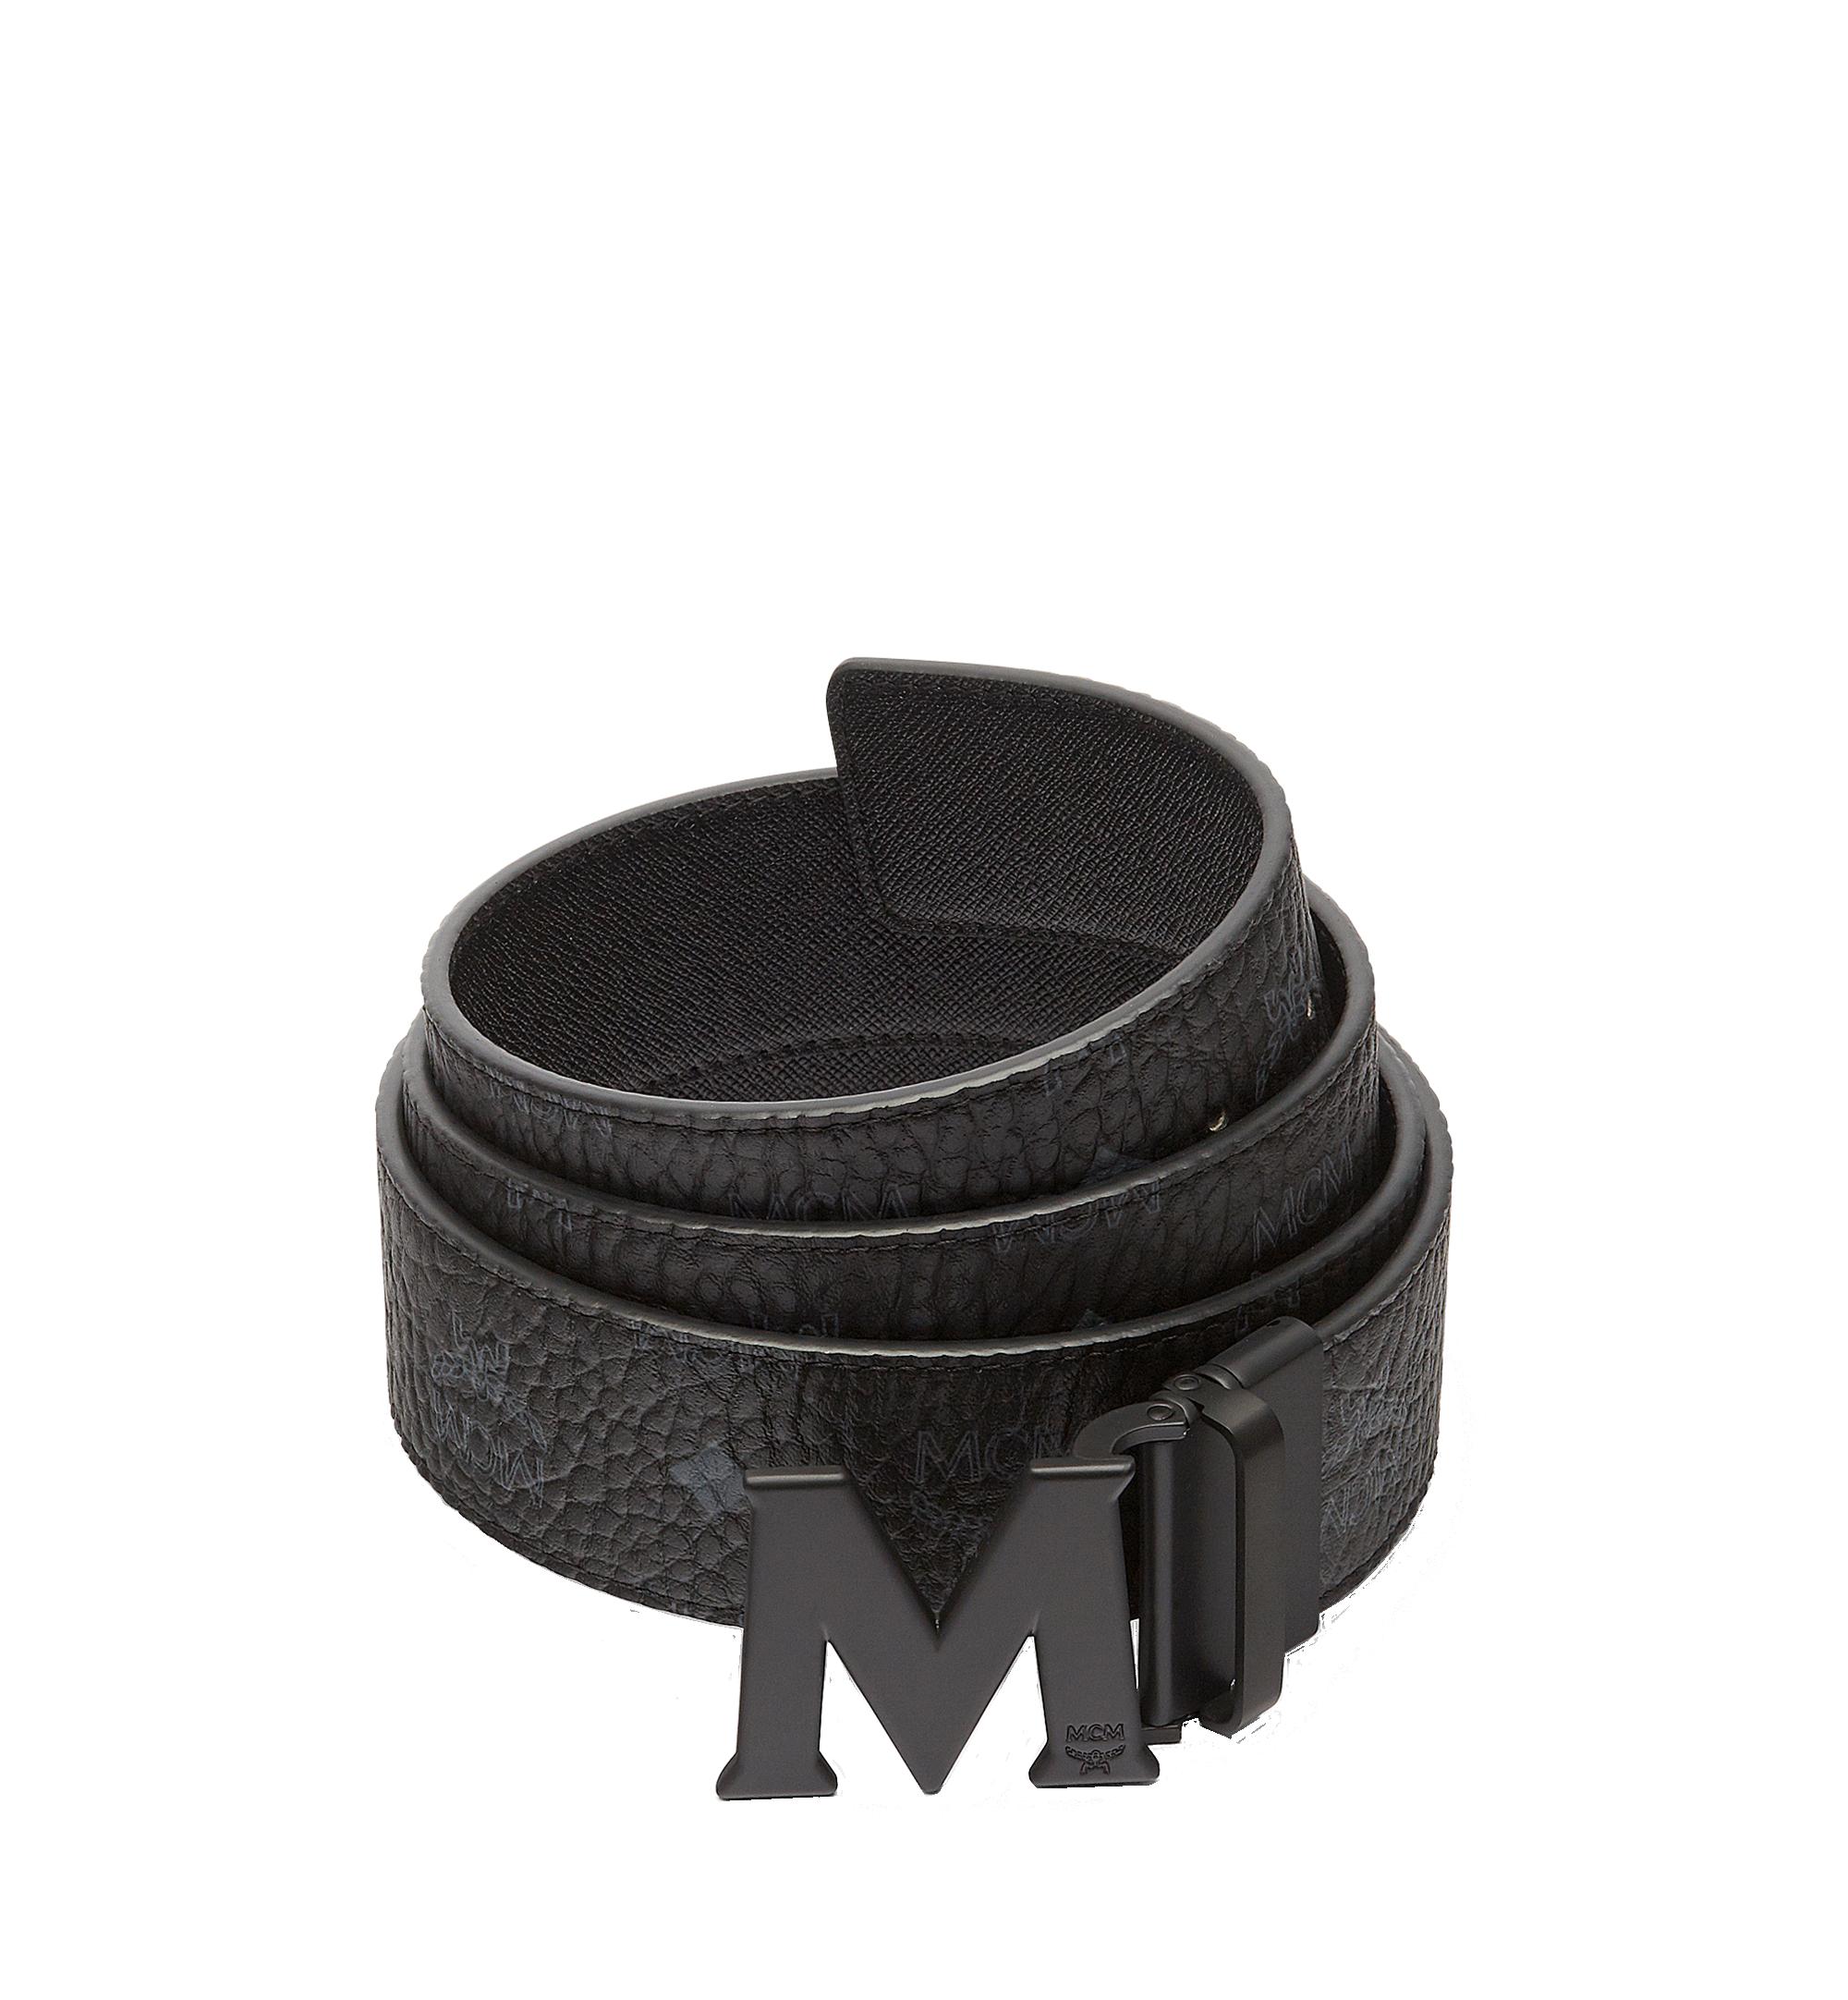 "MCM Claus M Reversible Belt 1.75"" in Visetos Black MXB7SVI10BK001 Alternate View 1"